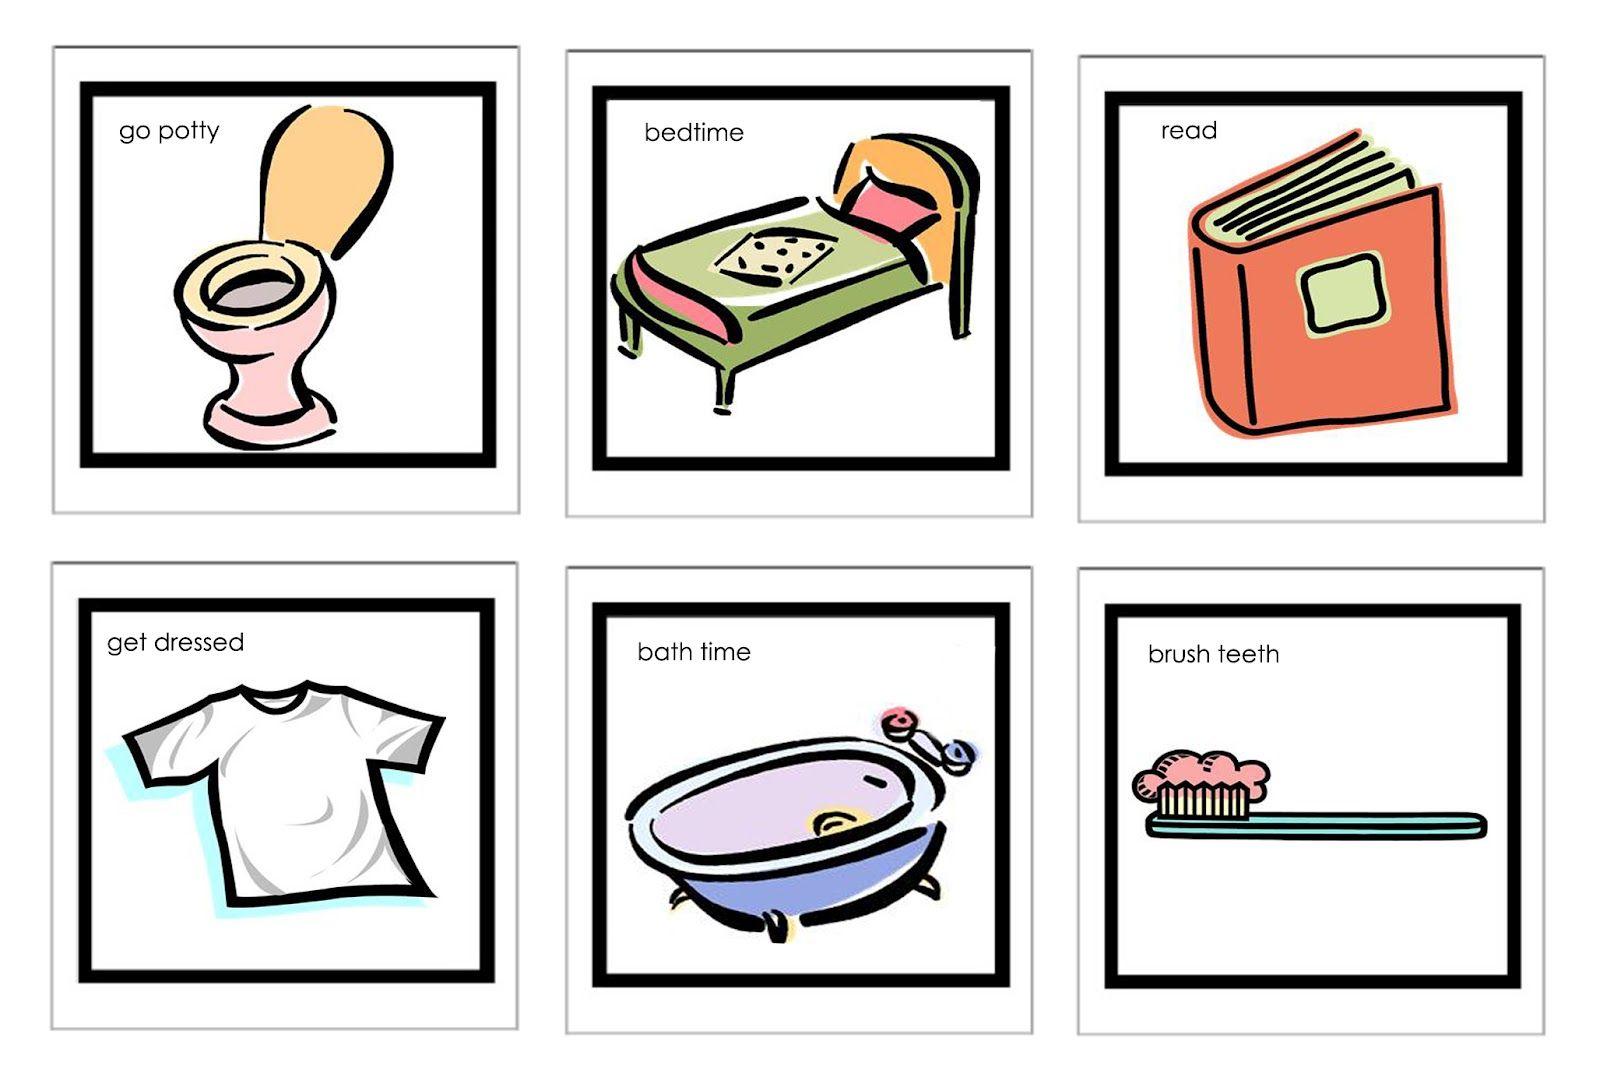 diy visual schedule for kids link to more clipart homeschool rh pinterest com chore chart clip art for kids children's chore chart clipart